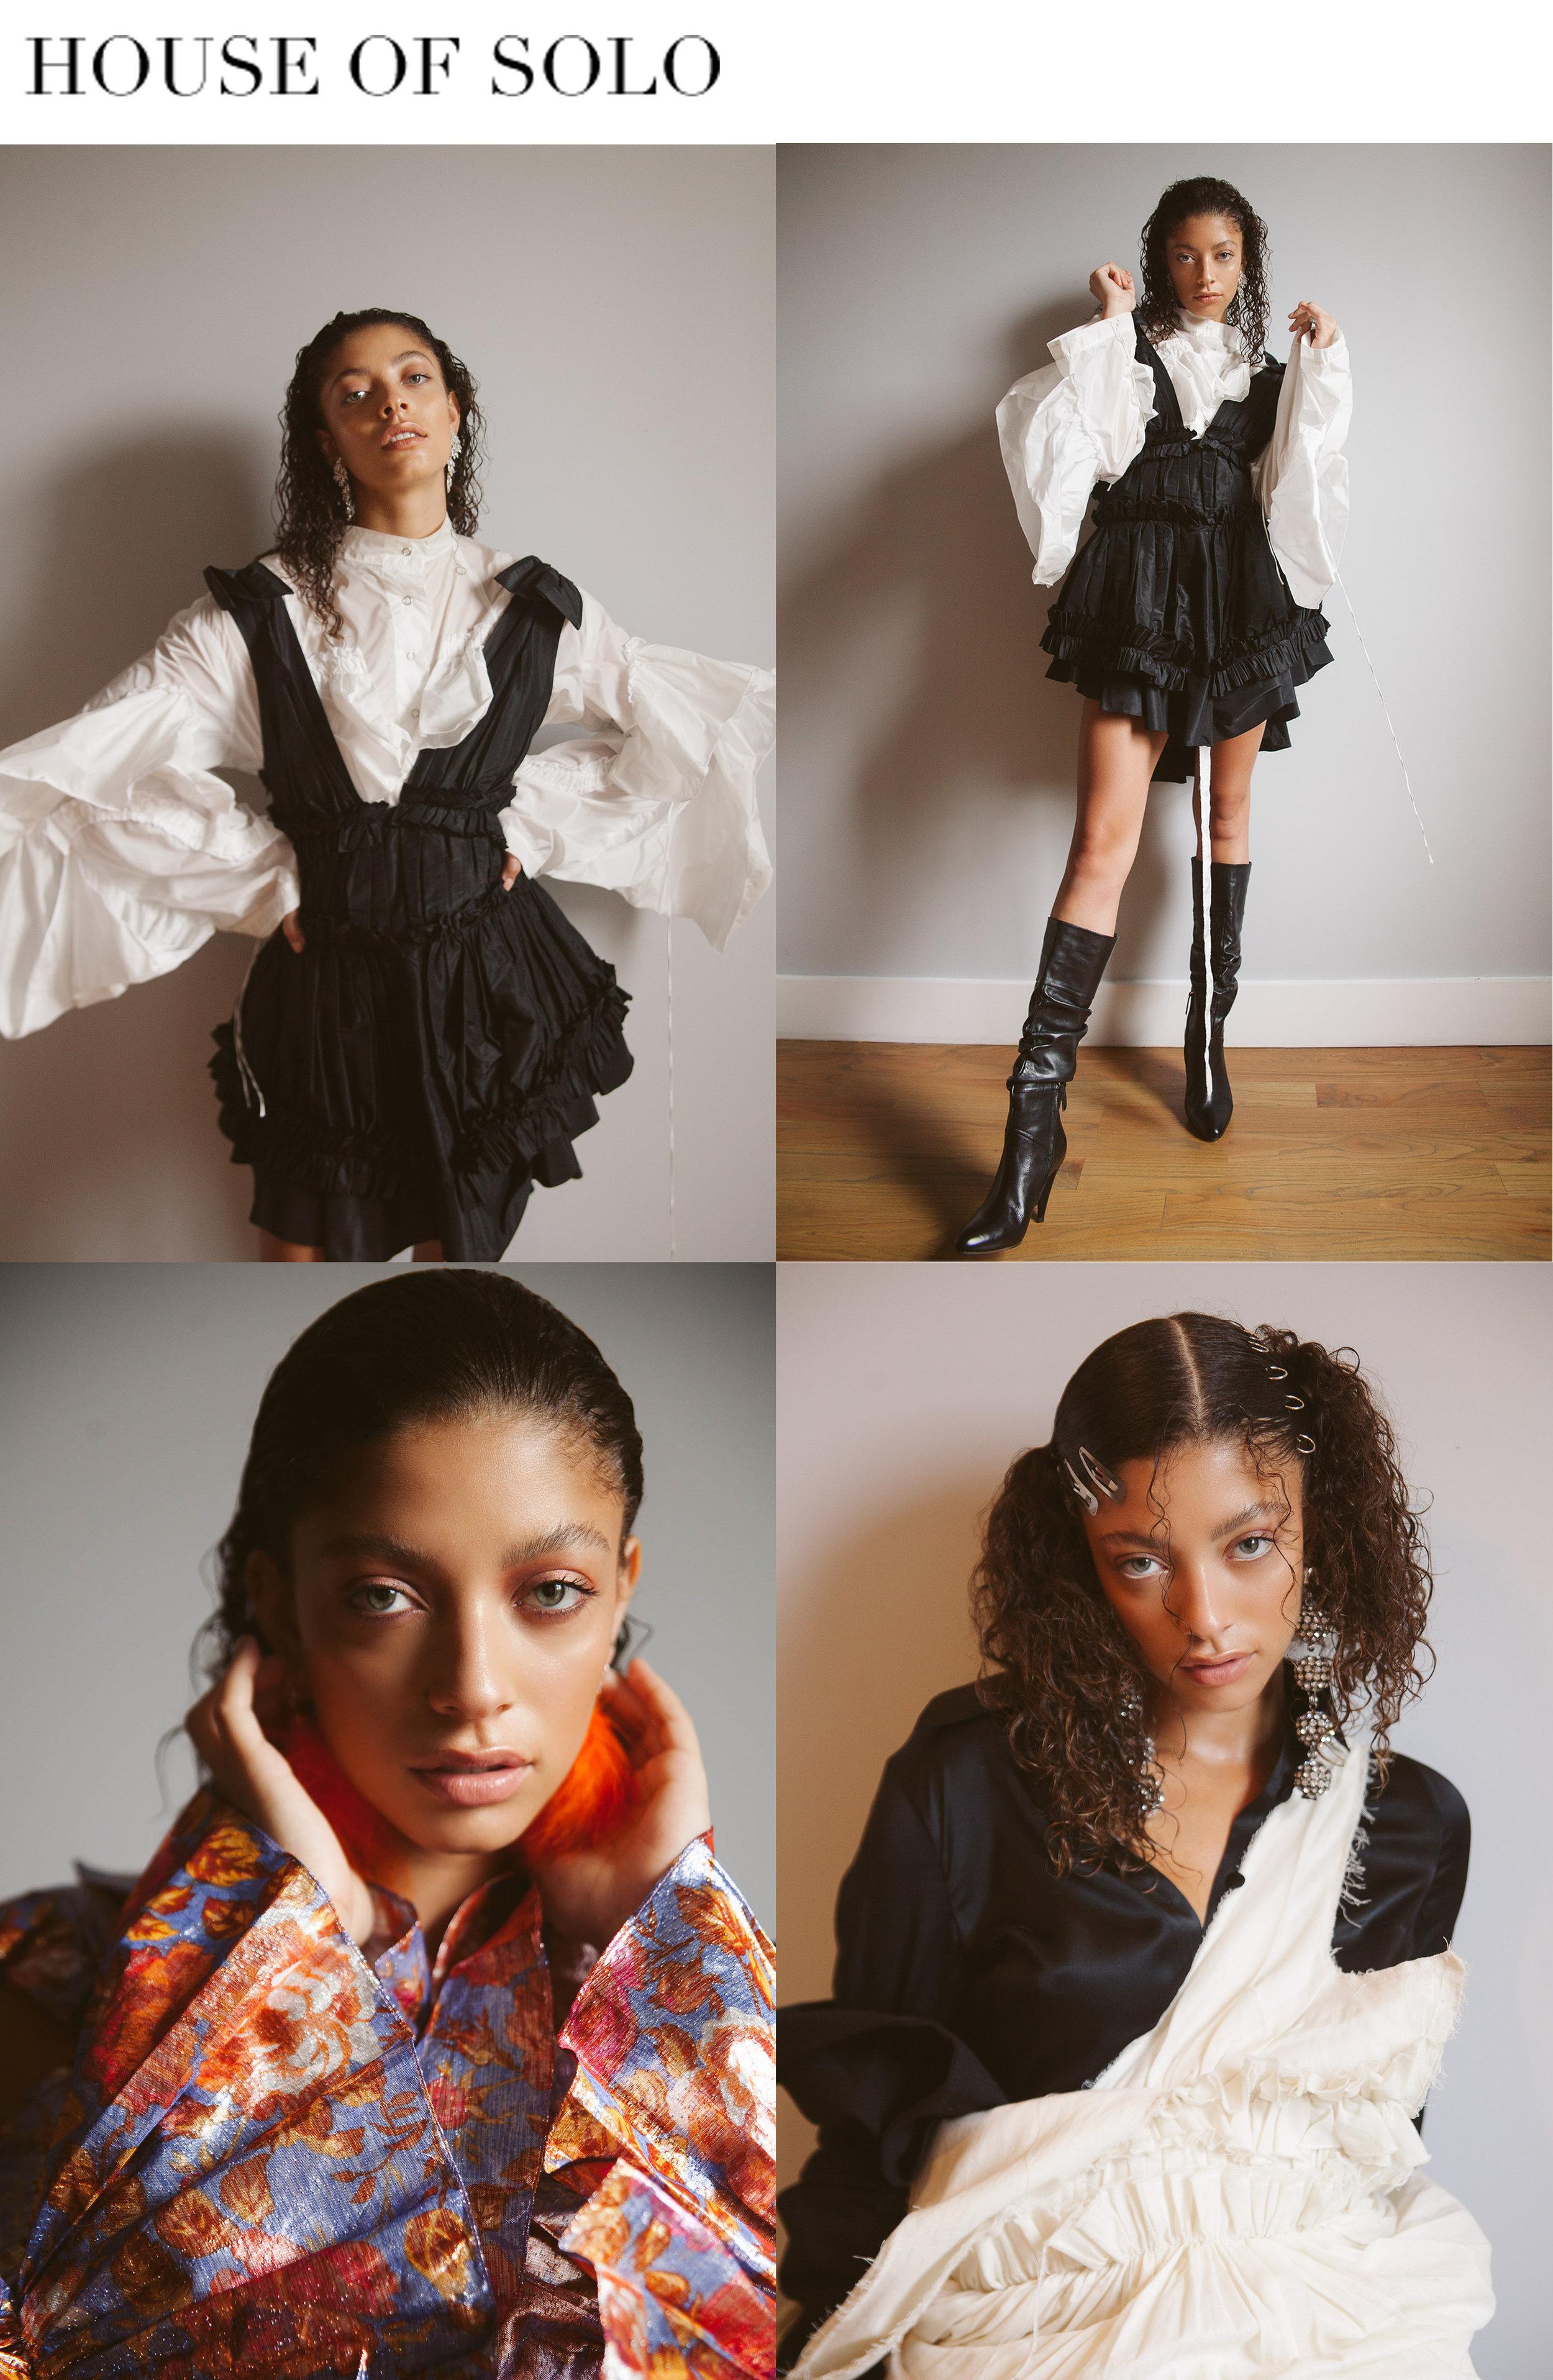 house of solo fashion editorial featuring kelsey randall black silk taffeta gathered ruffle mini jumper dress, floral silk ruffle sleeve cold shoulder blouse and muslin dress   Photographer: Katie Borrazzo // www.katieborrazzo.com // @katieborrazzo  Model: Camryn Herold @ Elite // @camrynherold  Stylist: Kingsley Osuji // www.kingsleyosuji.com // @kingsley_nyc  Hair: Payton Holbrook using Oribe @ Pazzion Salon NYC // @boytoy9  Makeup artist: Mariz Mikhail // @mariz.mik